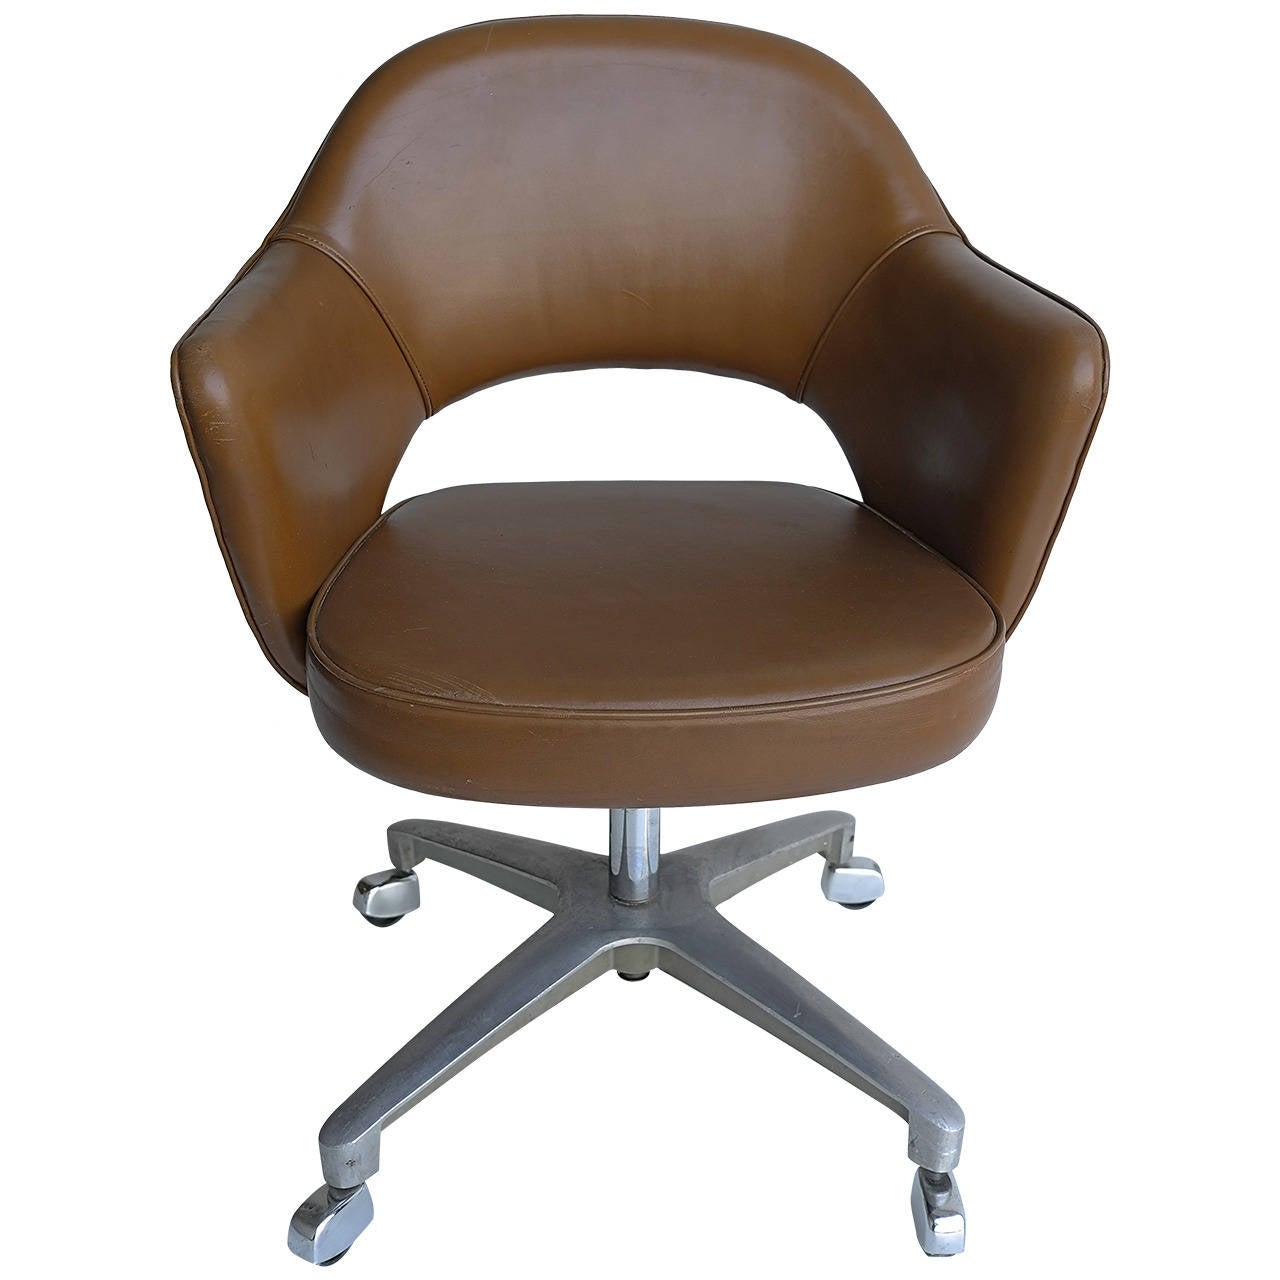 swivel chair office warehouse covers for folding chairs wedding eero saarinen armchair knoll sale at